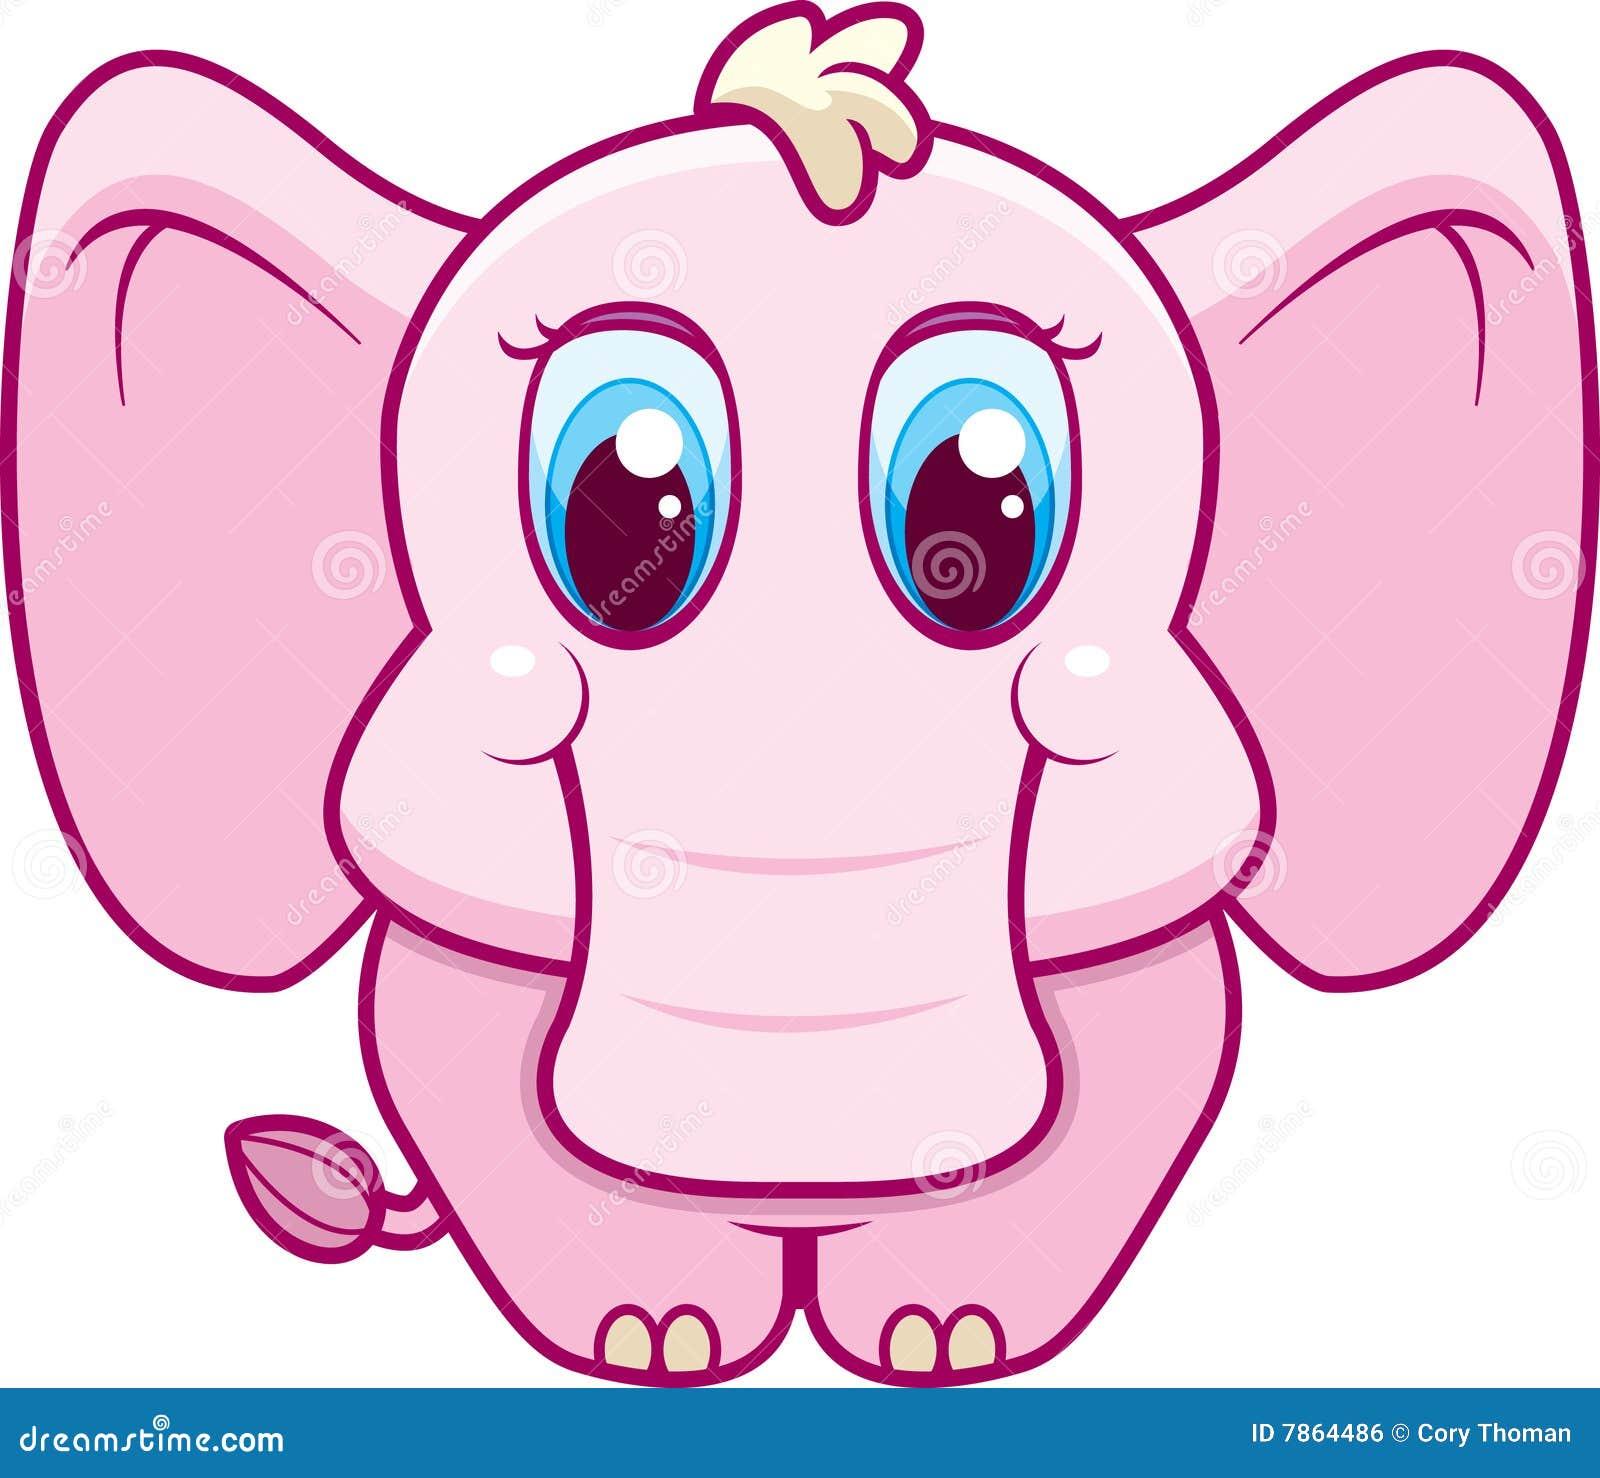 Dumbo The Elephant Disney Cartoon Wallpaper Border  White